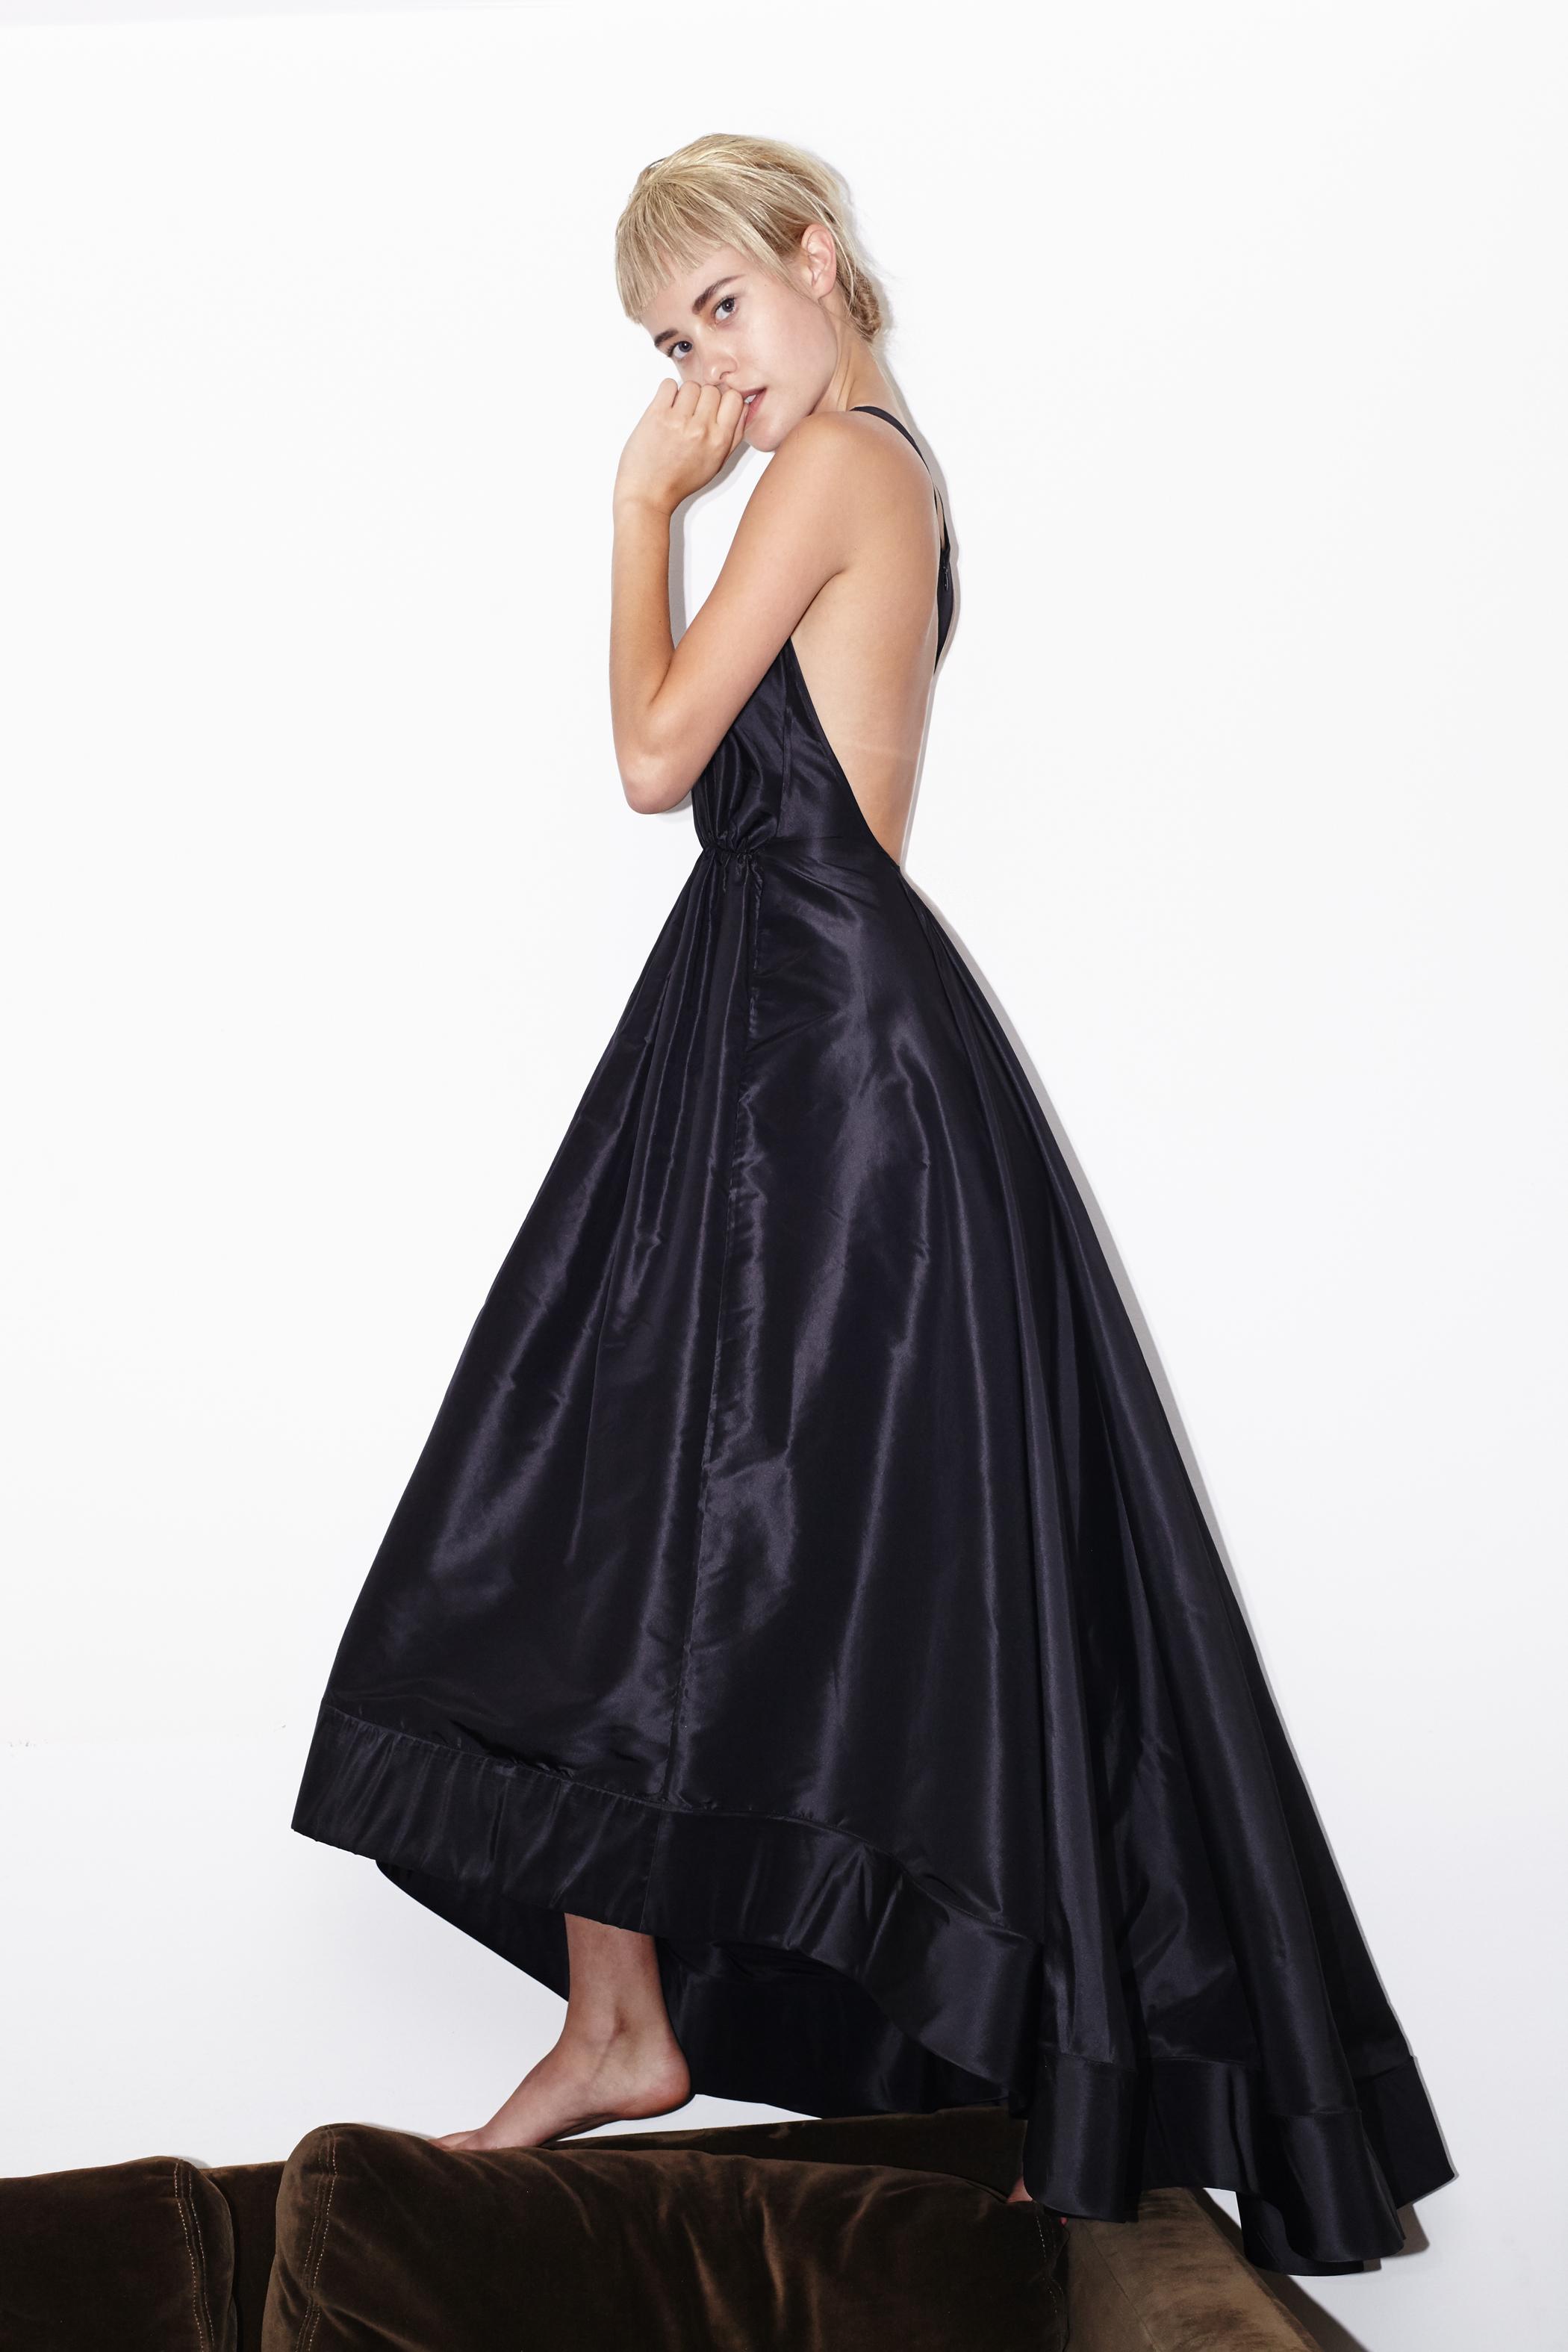 kelsey randall black silk taffeta a-line gown dress racer back dramatic red carpet bridesmaid wedding dress rehearsal dinner events red carpet